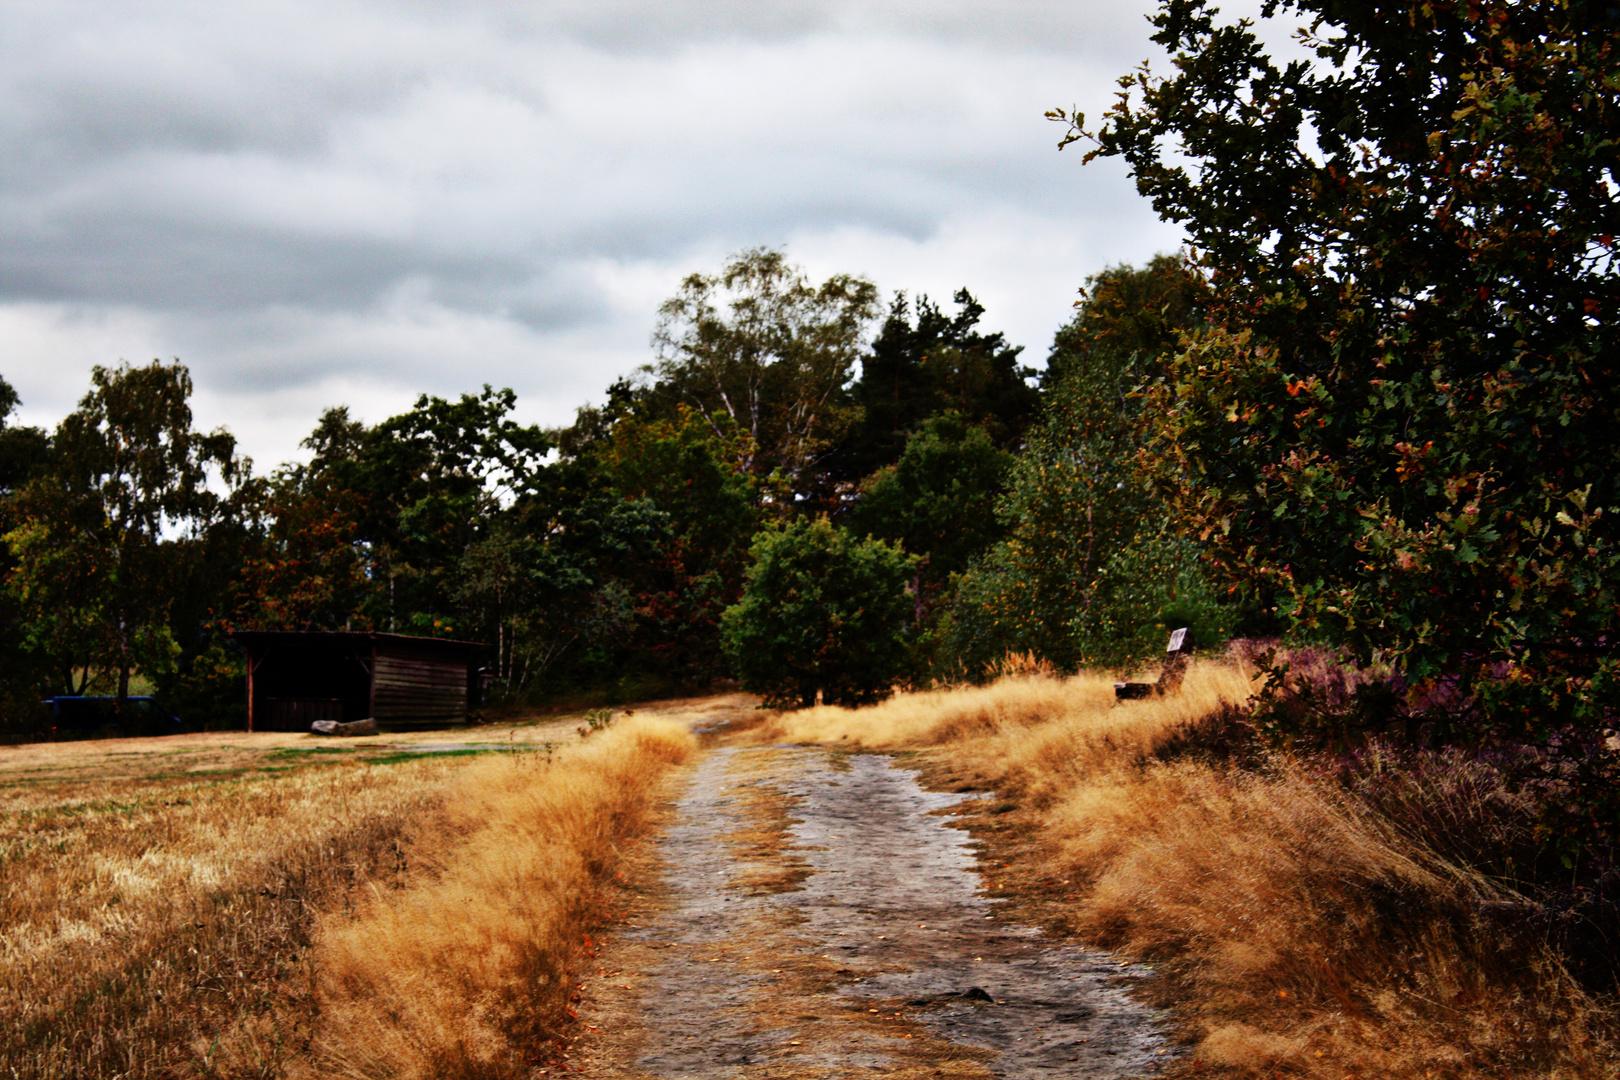 Spätsommer in der Heide